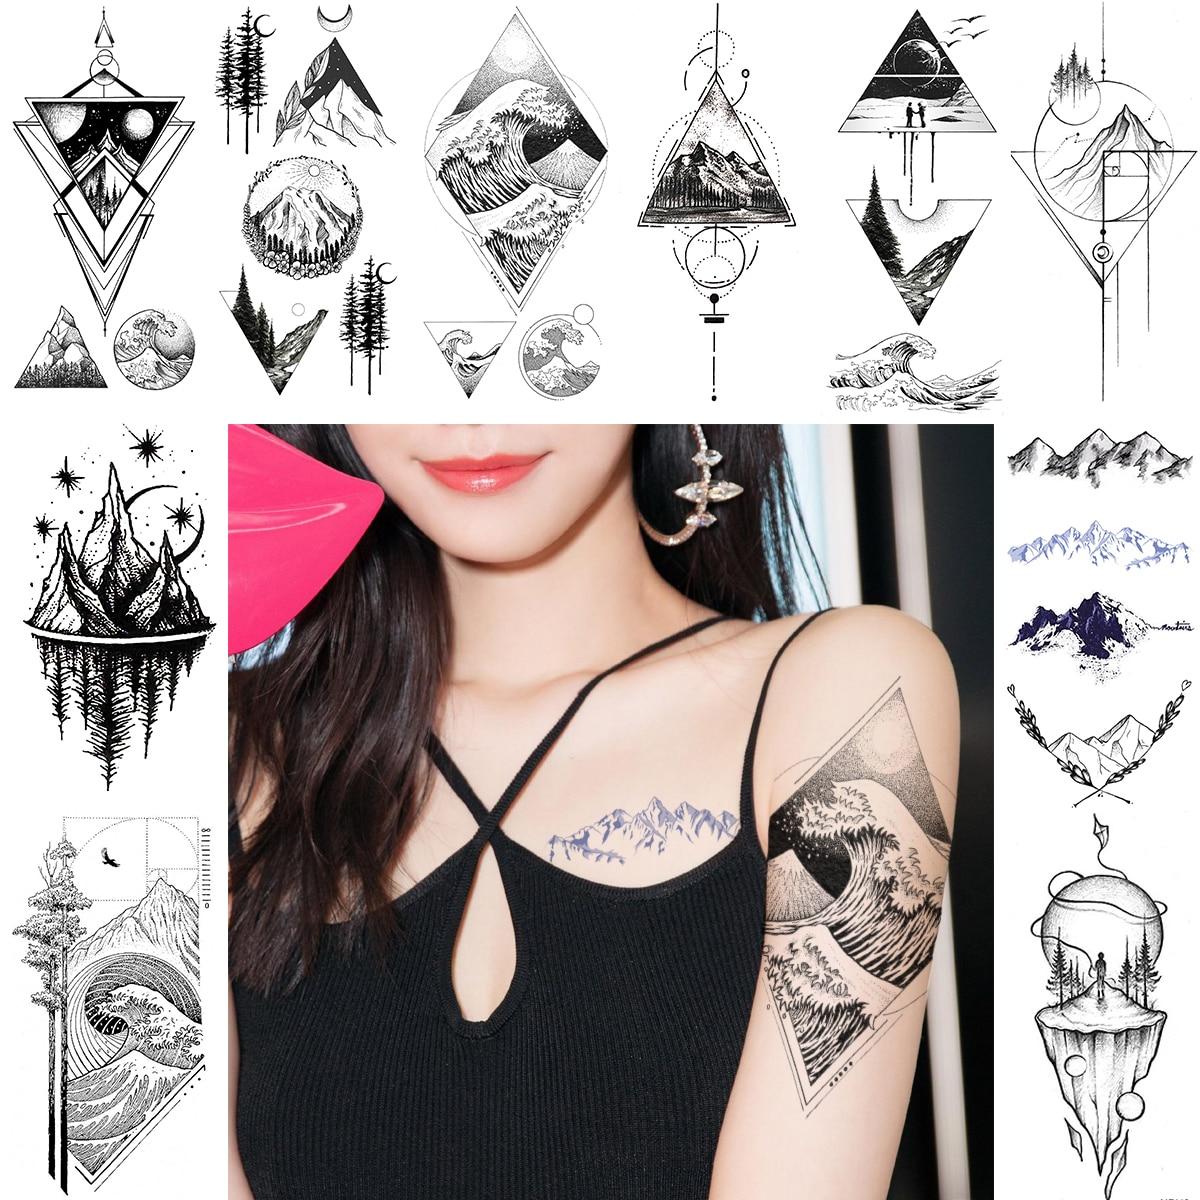 Diamond Rhombus Wave Temporary Tattoos Triangle Planets Mountain Tattoo Sticker For Men Women Geometric Body Art Arm Neck Tatoos(China)